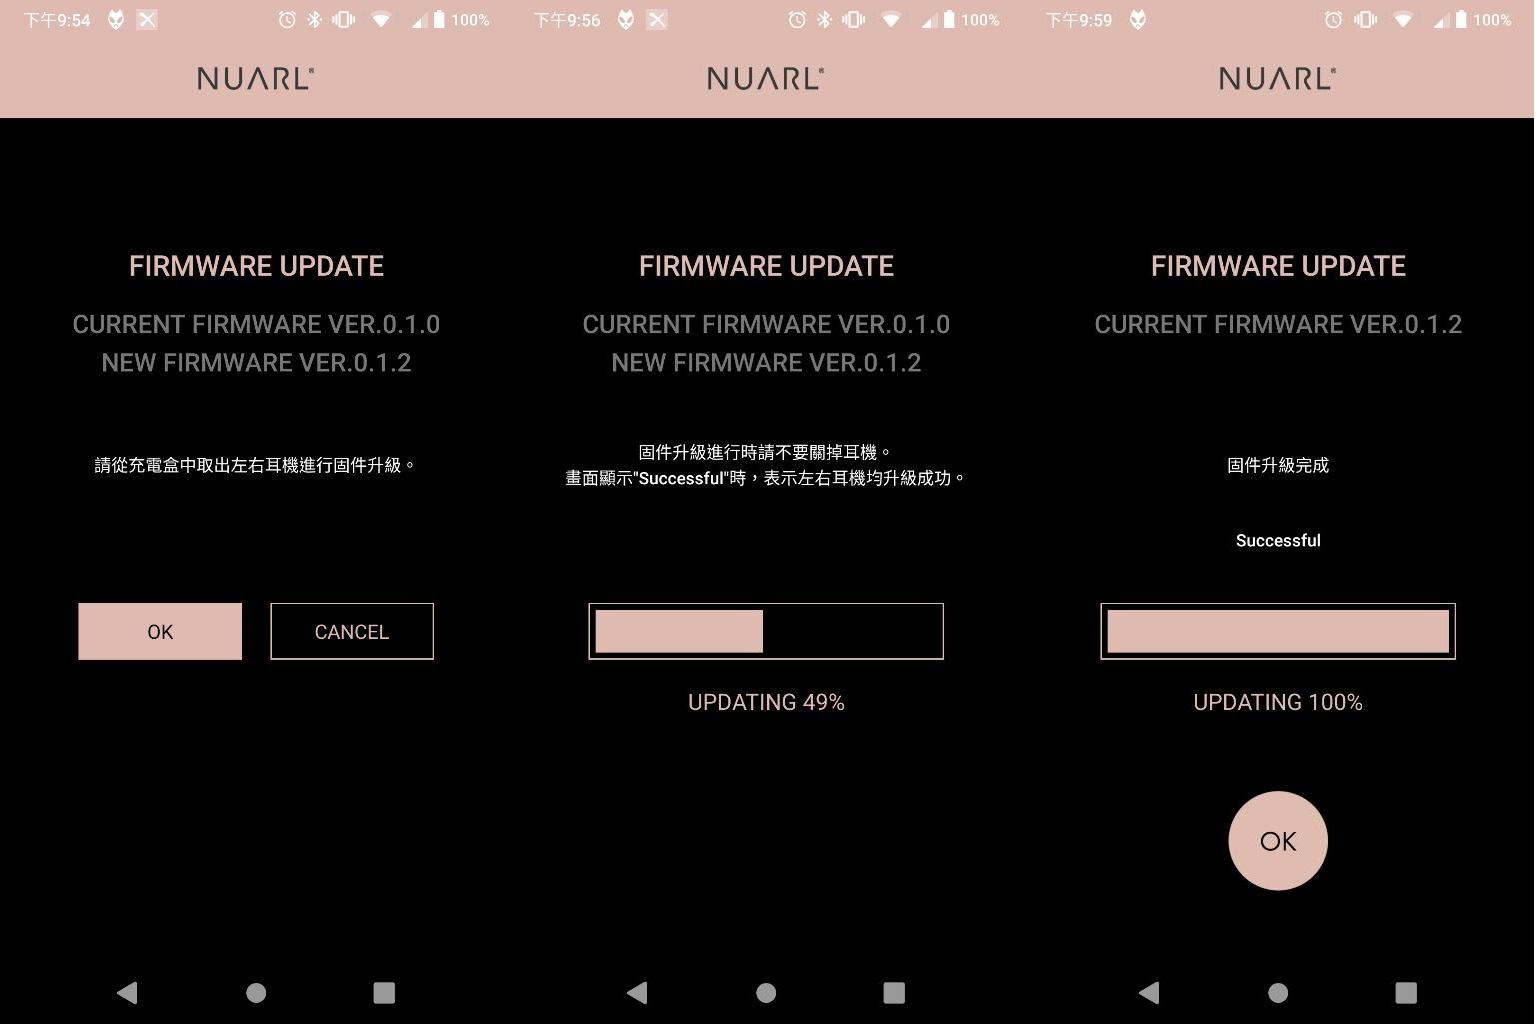 Nuarl N10 Pro真無線藍牙耳機-搭載HDSS專利技術與10mm獨家動圈...7512